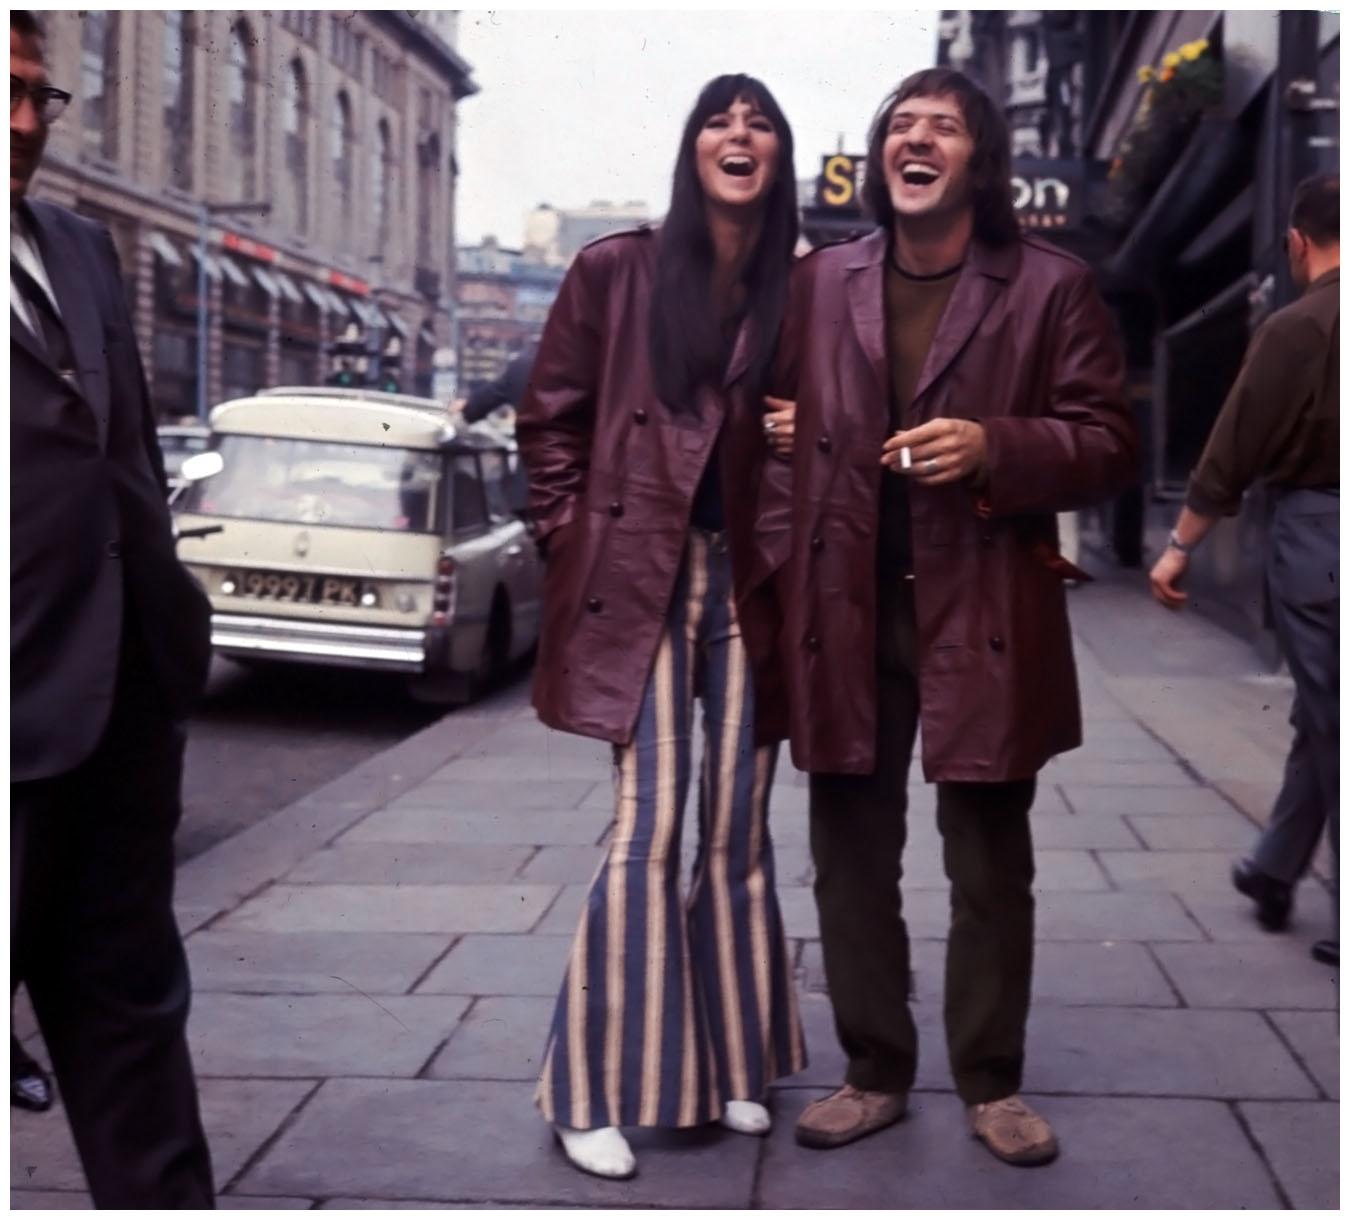 Sonny Amp Cher 1965 169 Jazzinphoto